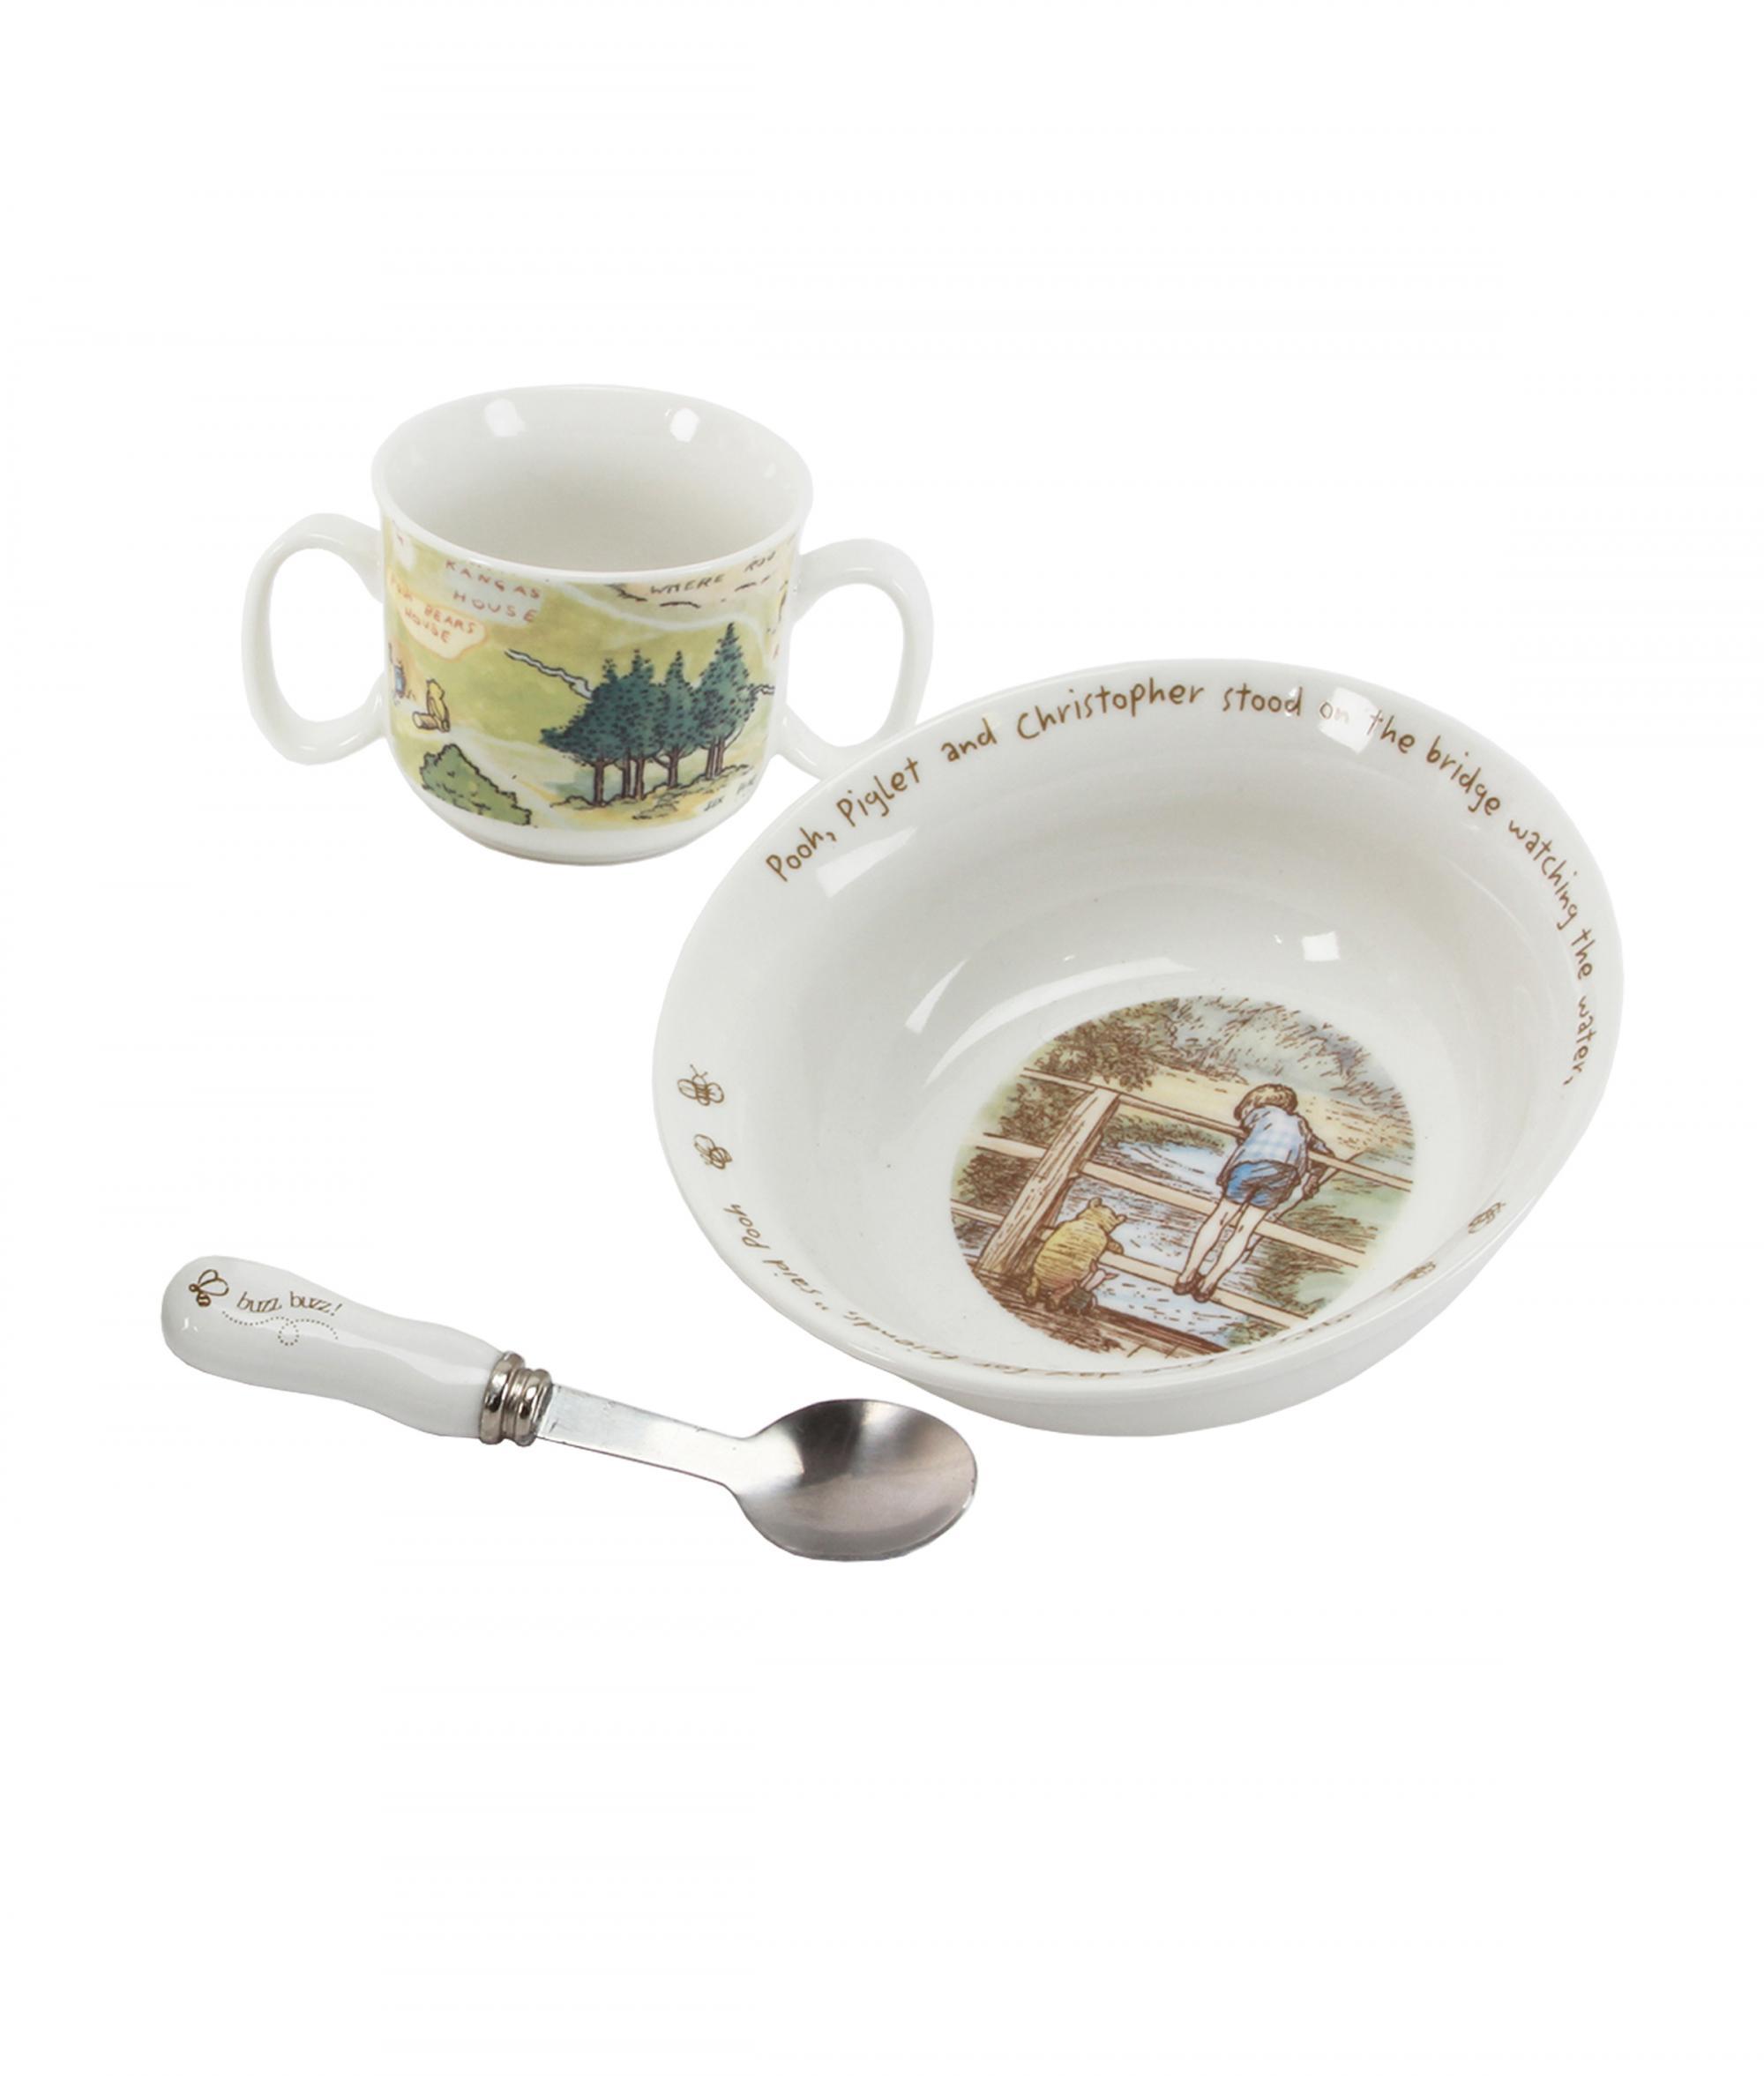 Disney Baby Gifts Uk : Disney classic pooh heritage bowl and mug